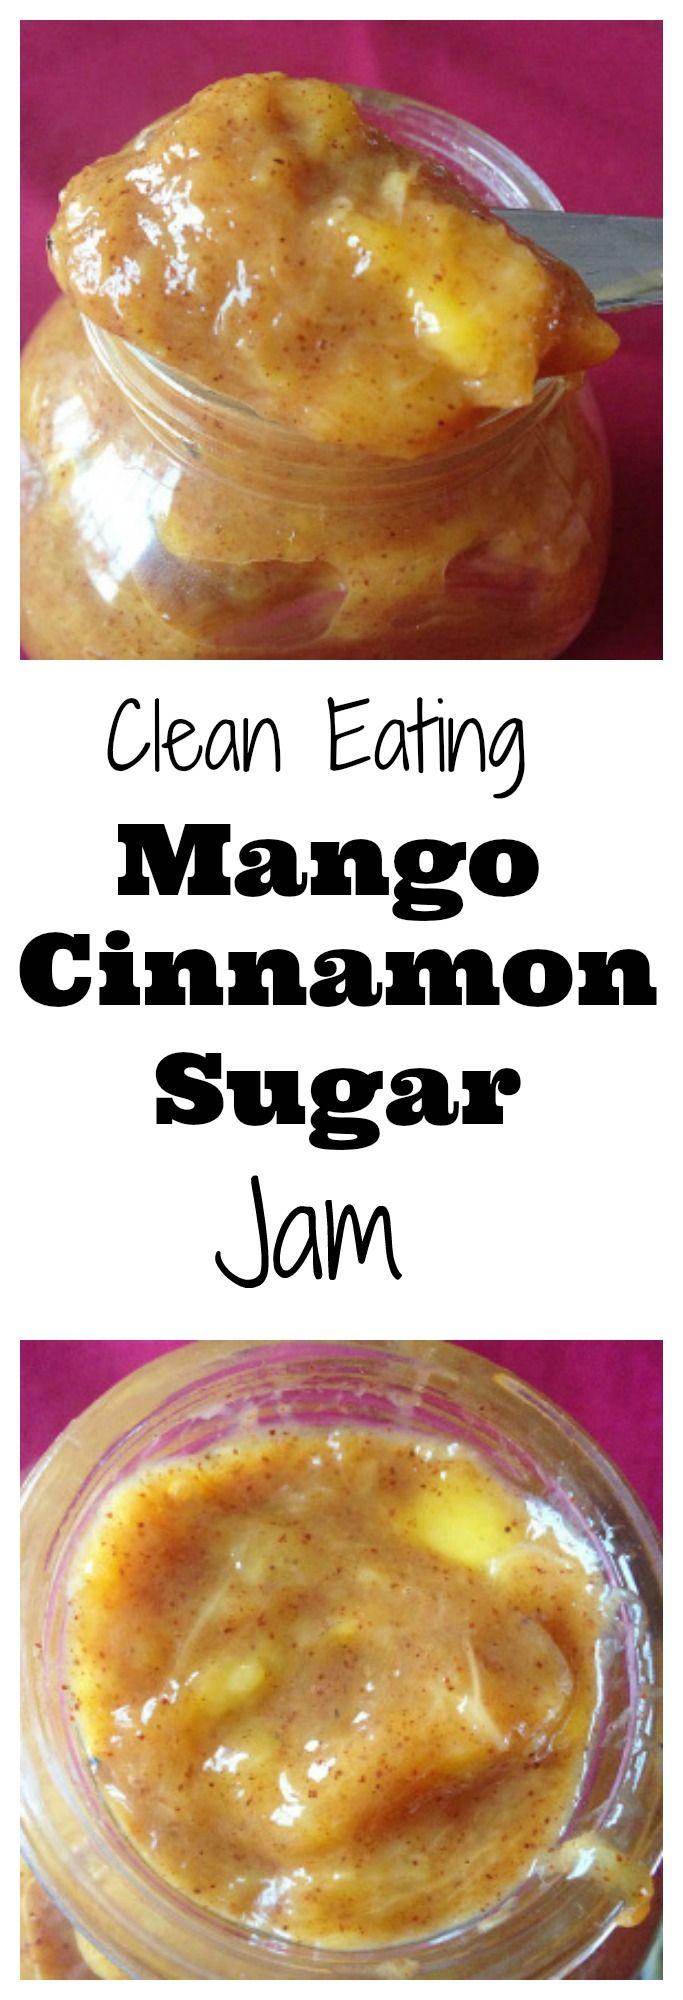 Mango Cinnamon-Sugar Jam! The perfect spread on toast, waffles, pancakes, ice cream, yogurt, you name it!